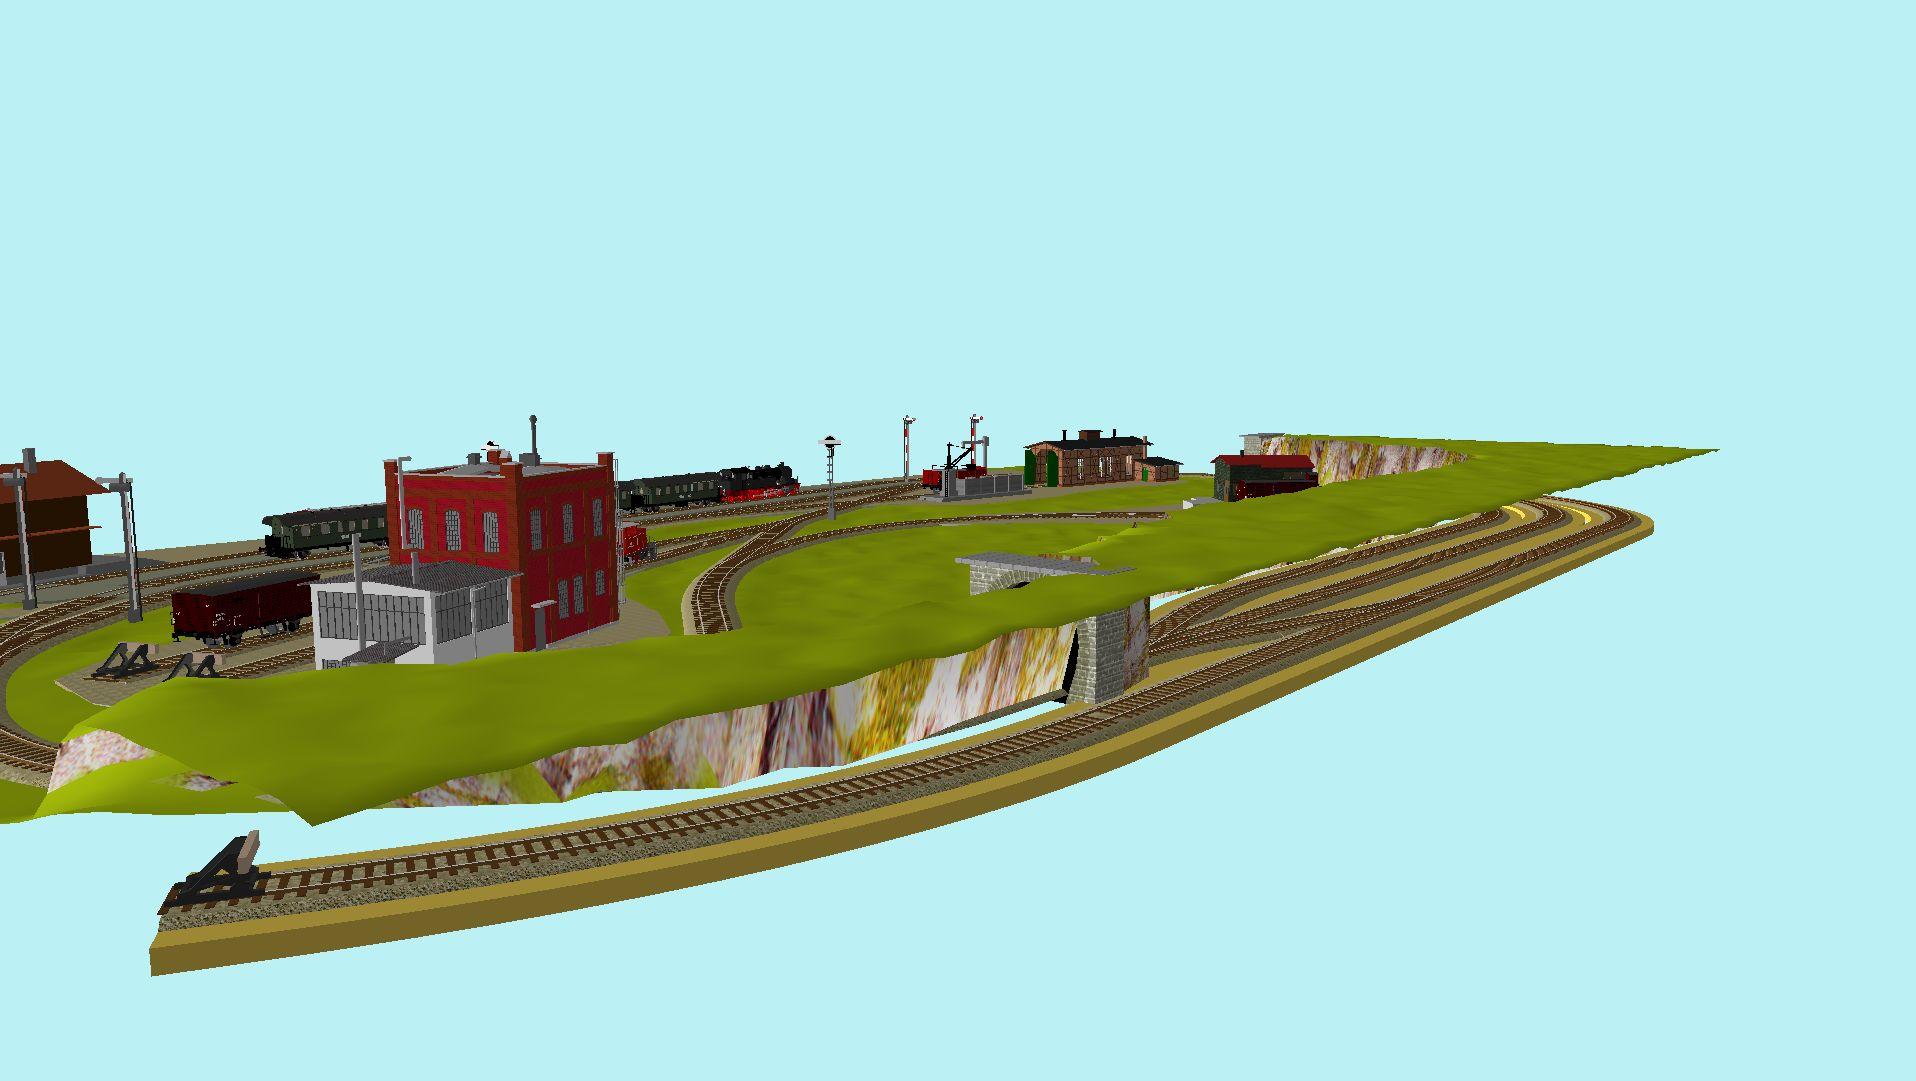 'ALBA Modellbahnpraxis' Band 1, Plan 5 Amp-1_5_5o3j4r